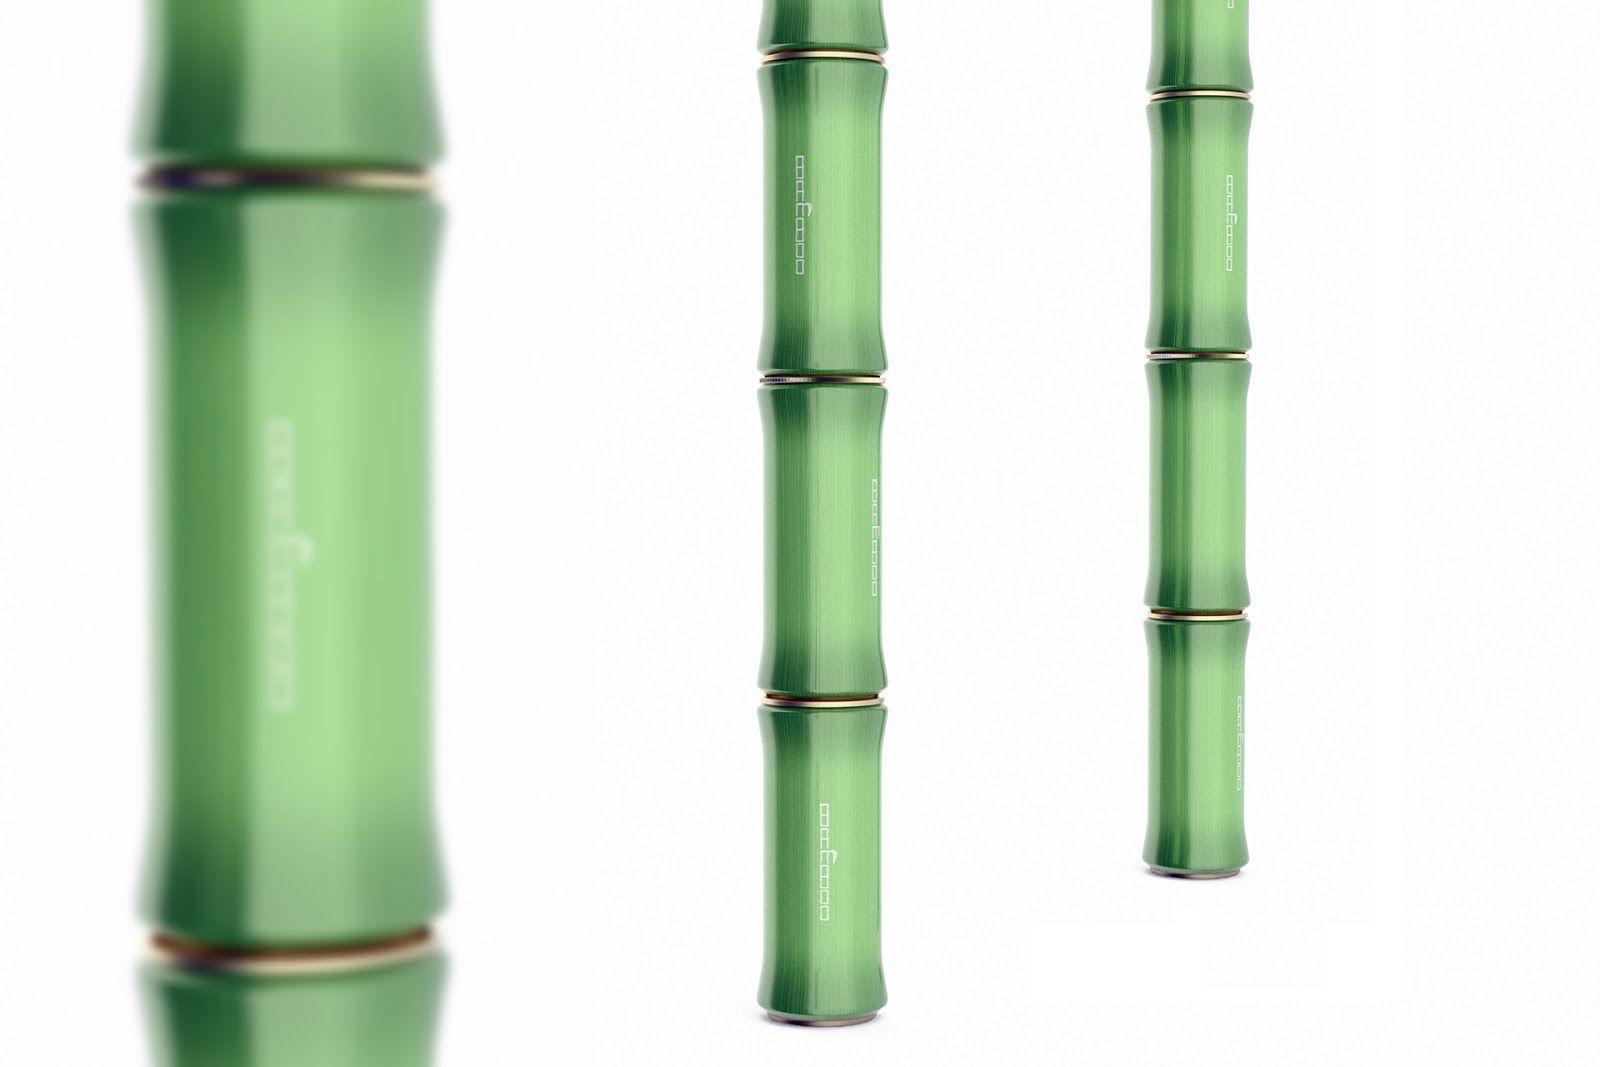 Bamboo (boisson de bambou) I Design (concept) : Marcel Sheishenov, Bishkek, Kyrgyzstan (juillet 2017)